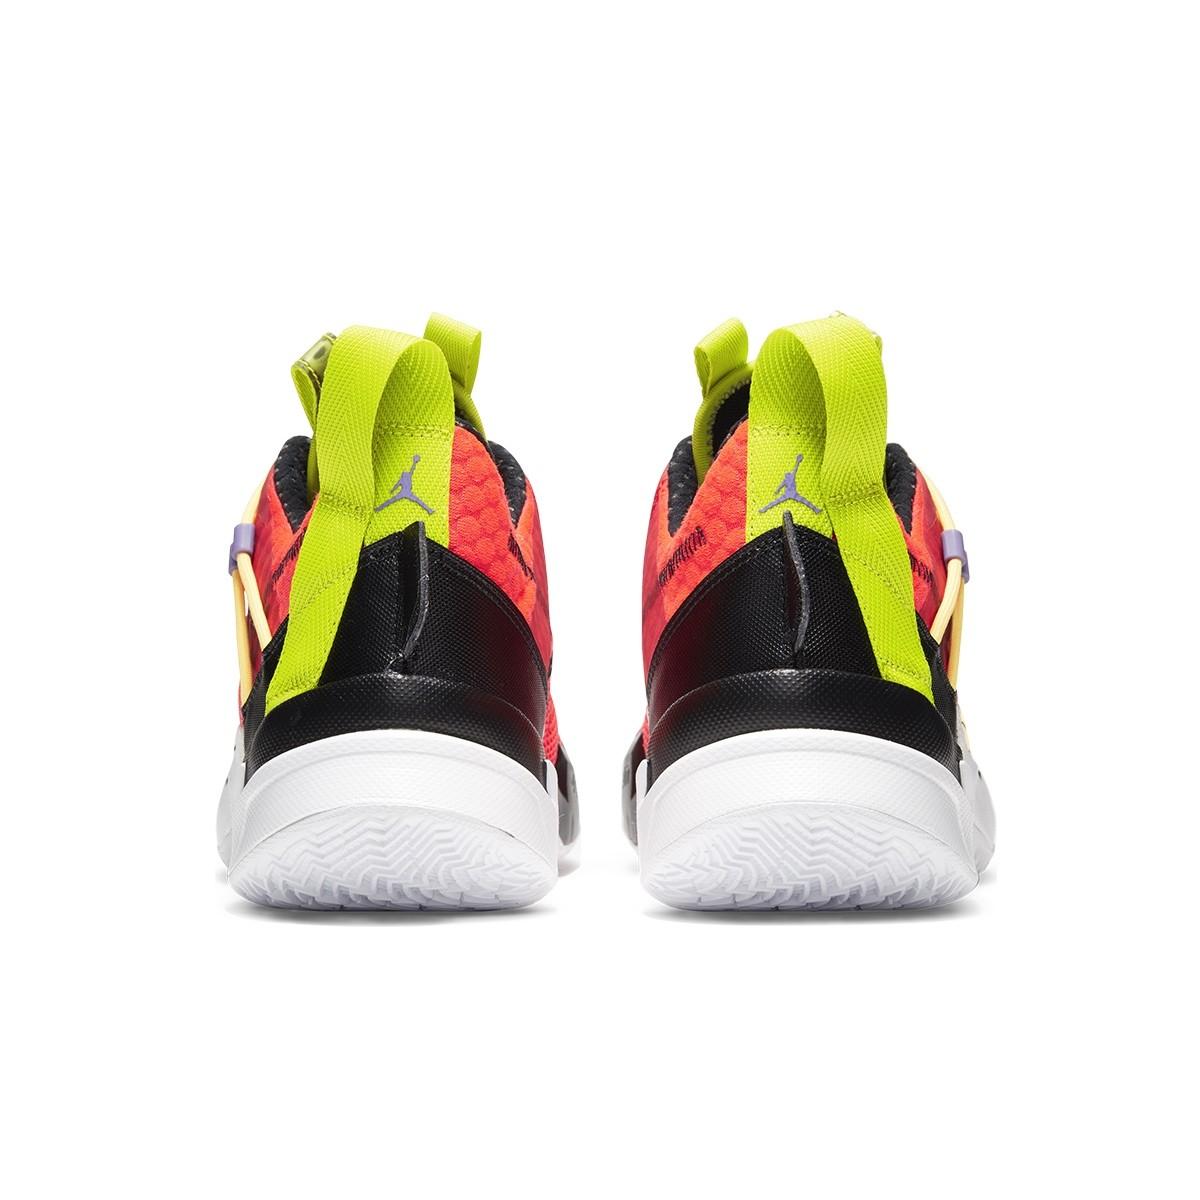 Jordan Why Not Zer0.3 SE GS 'Bright Crimson'-CN8107-600